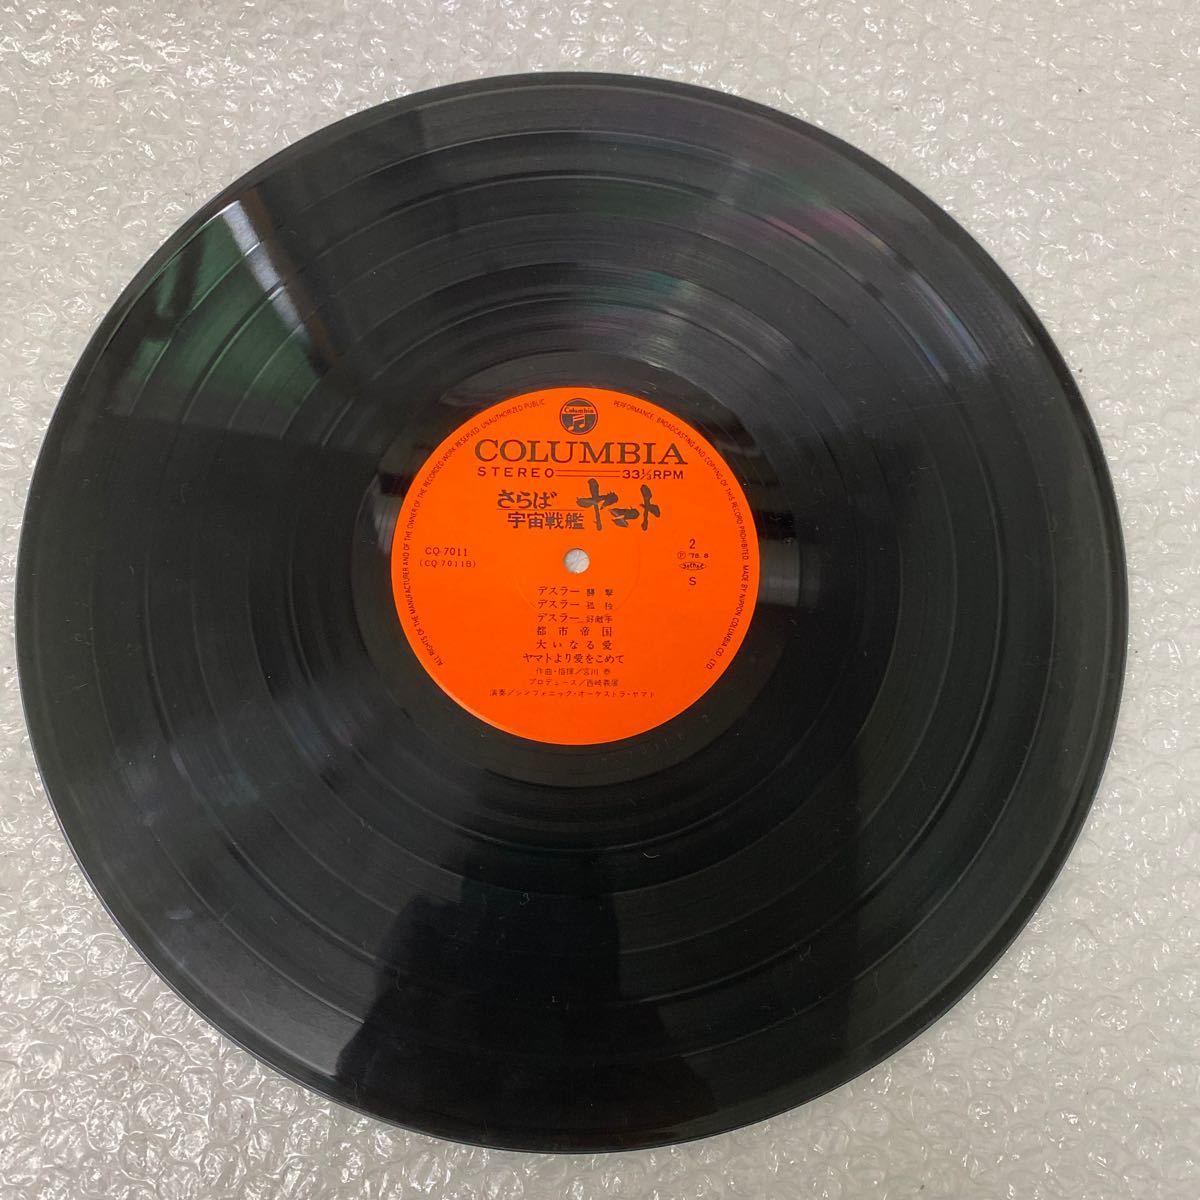 【LP】さらば宇宙戦艦ヤマト 愛の戦士たち 映画音楽集/オリジナルサウンドトラック(CQ-7011)日本コロムビア_画像8